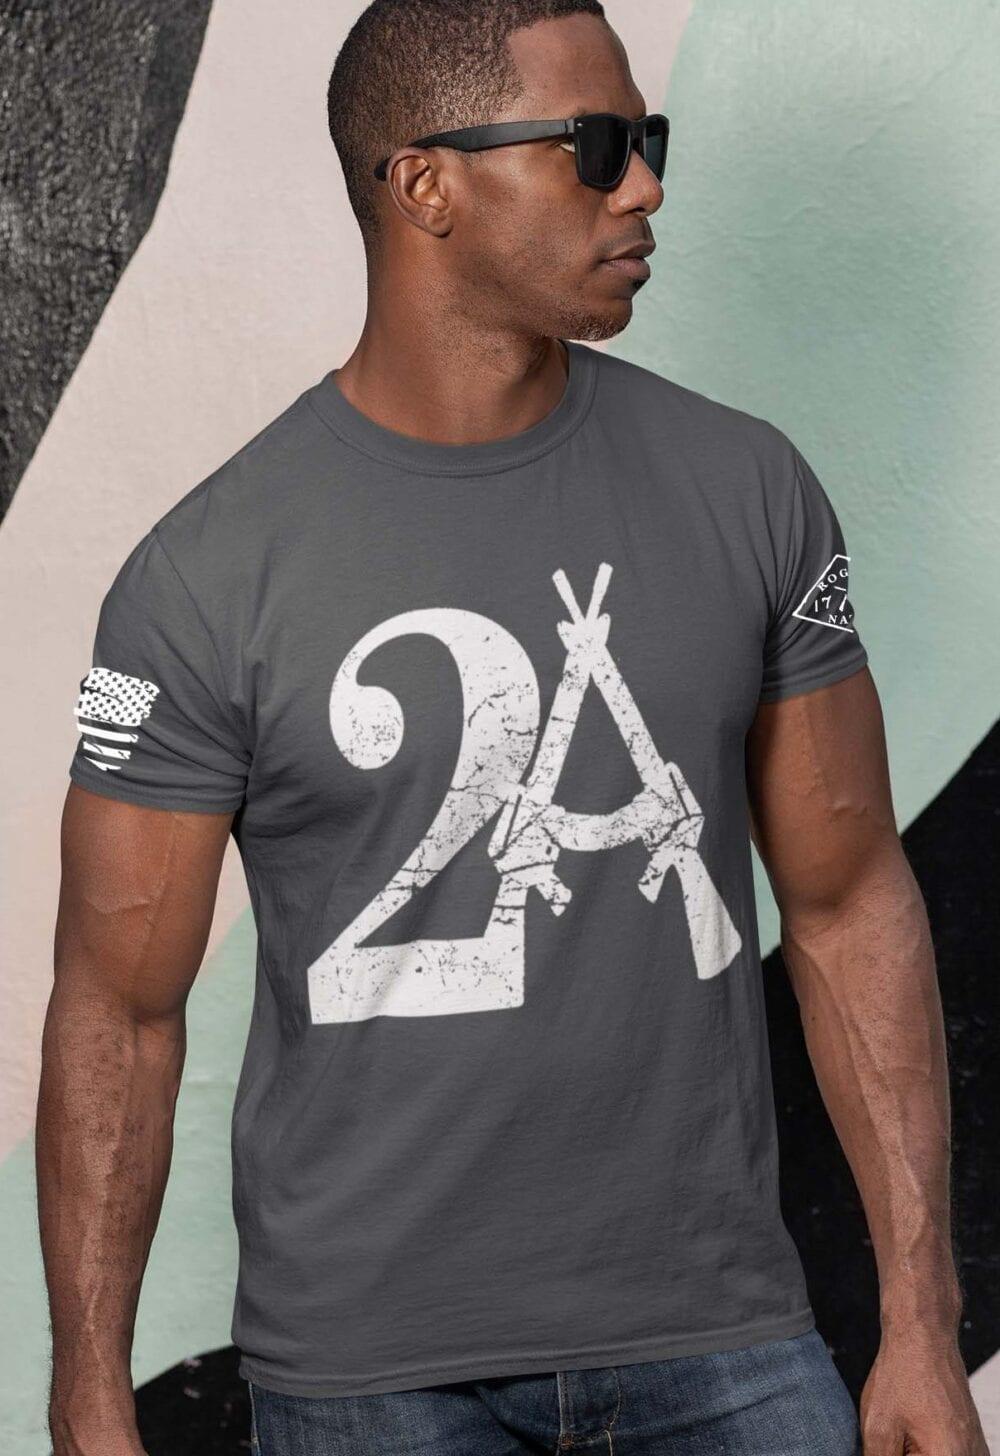 2A on Mens Charcoal T-Shirt